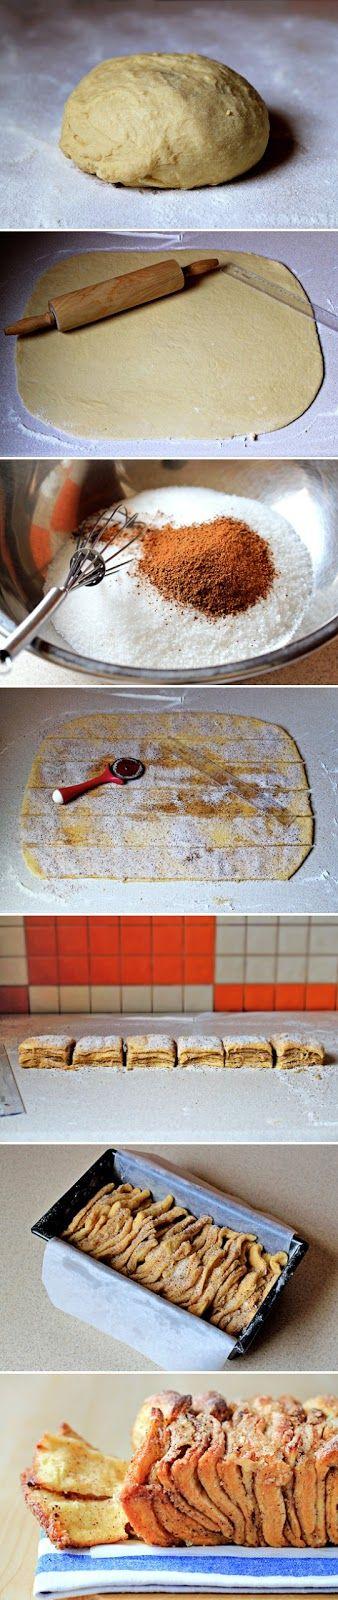 Pull-Apart Cinnamon Sugar Bread   Bread, muffins, pastries and rolls ...